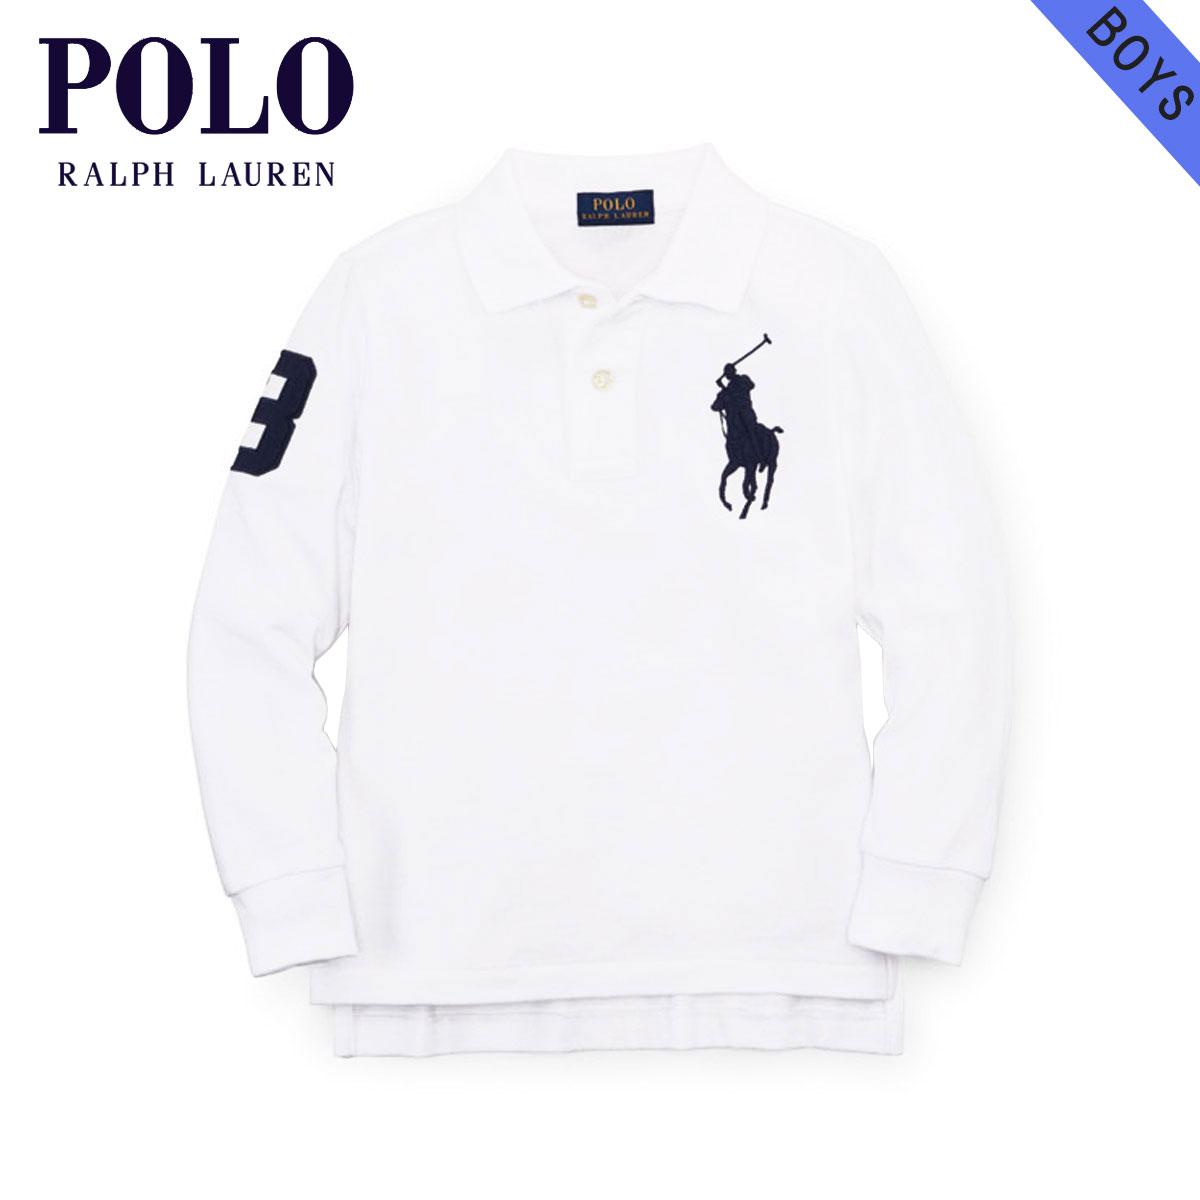 c8795589 Polo Ralph Lauren kids POLO RALPH LAUREN CHILDREN regular article children's  clothes boys long sleeves polo